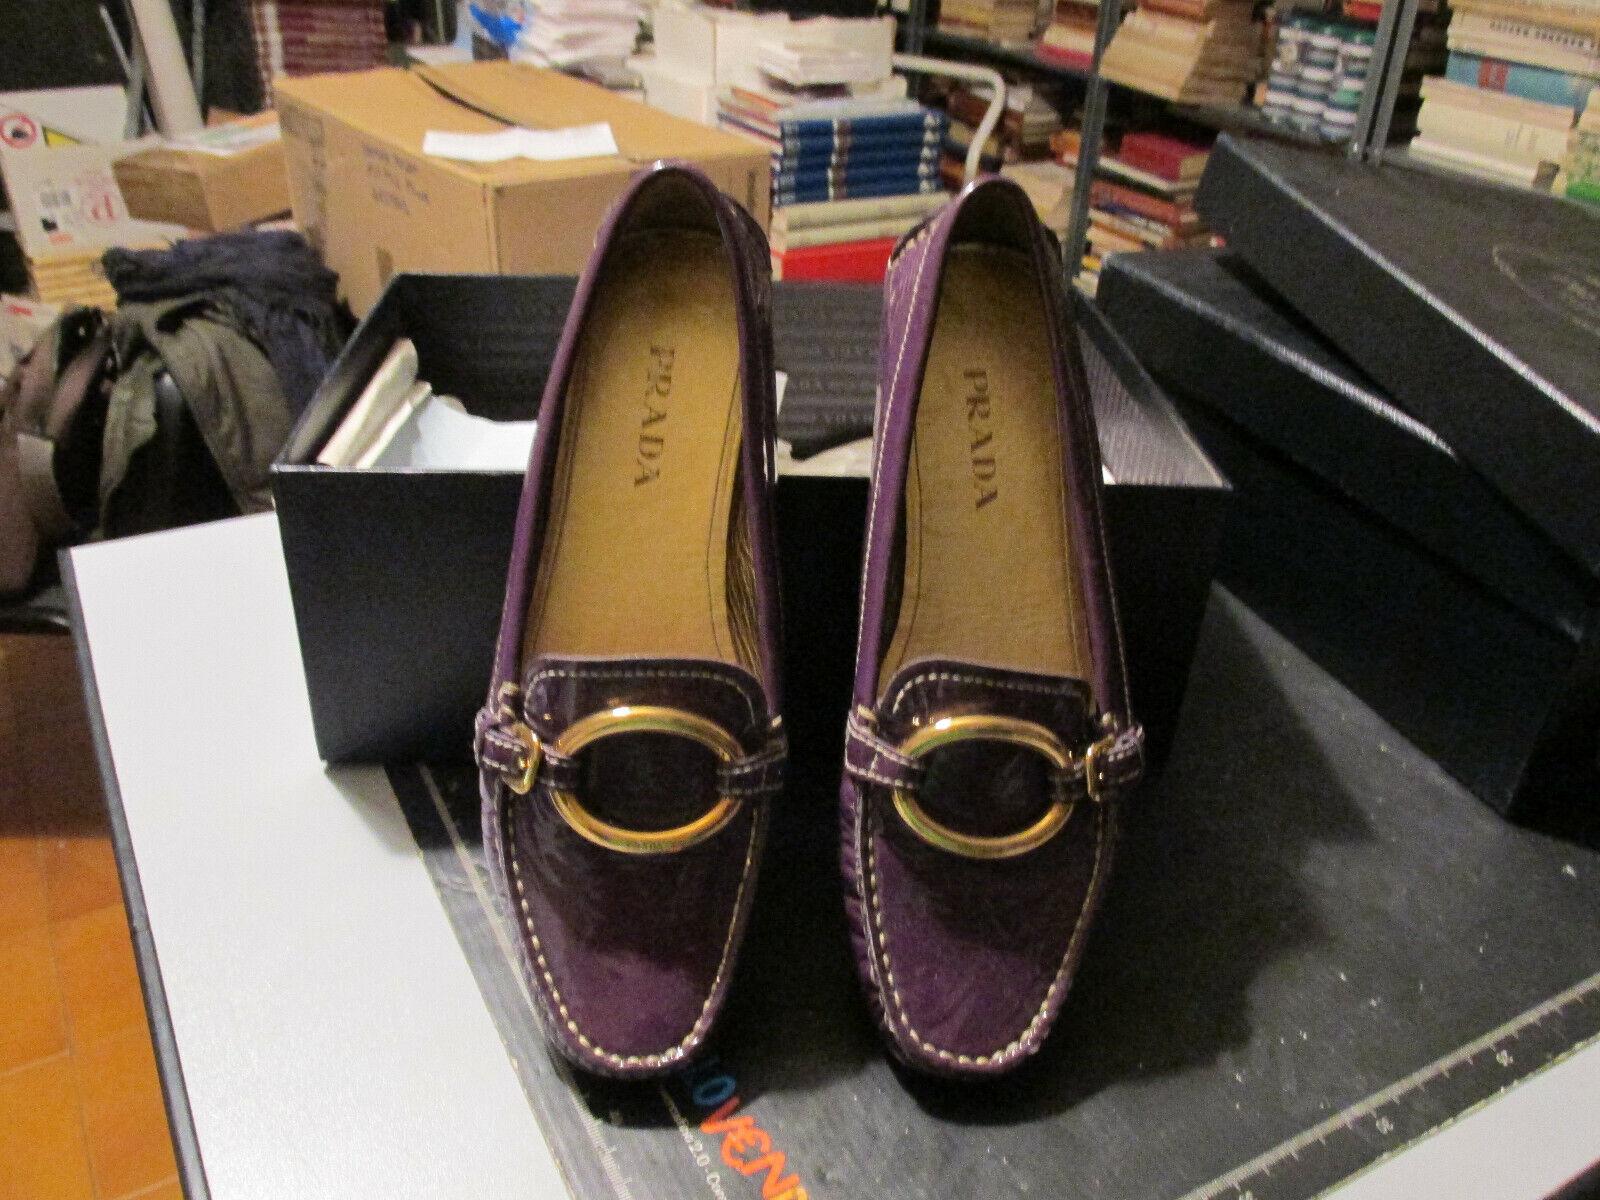 Prada púrpura in pelle da Infilare Mocassino zapatos numero 37 mujer ottimo